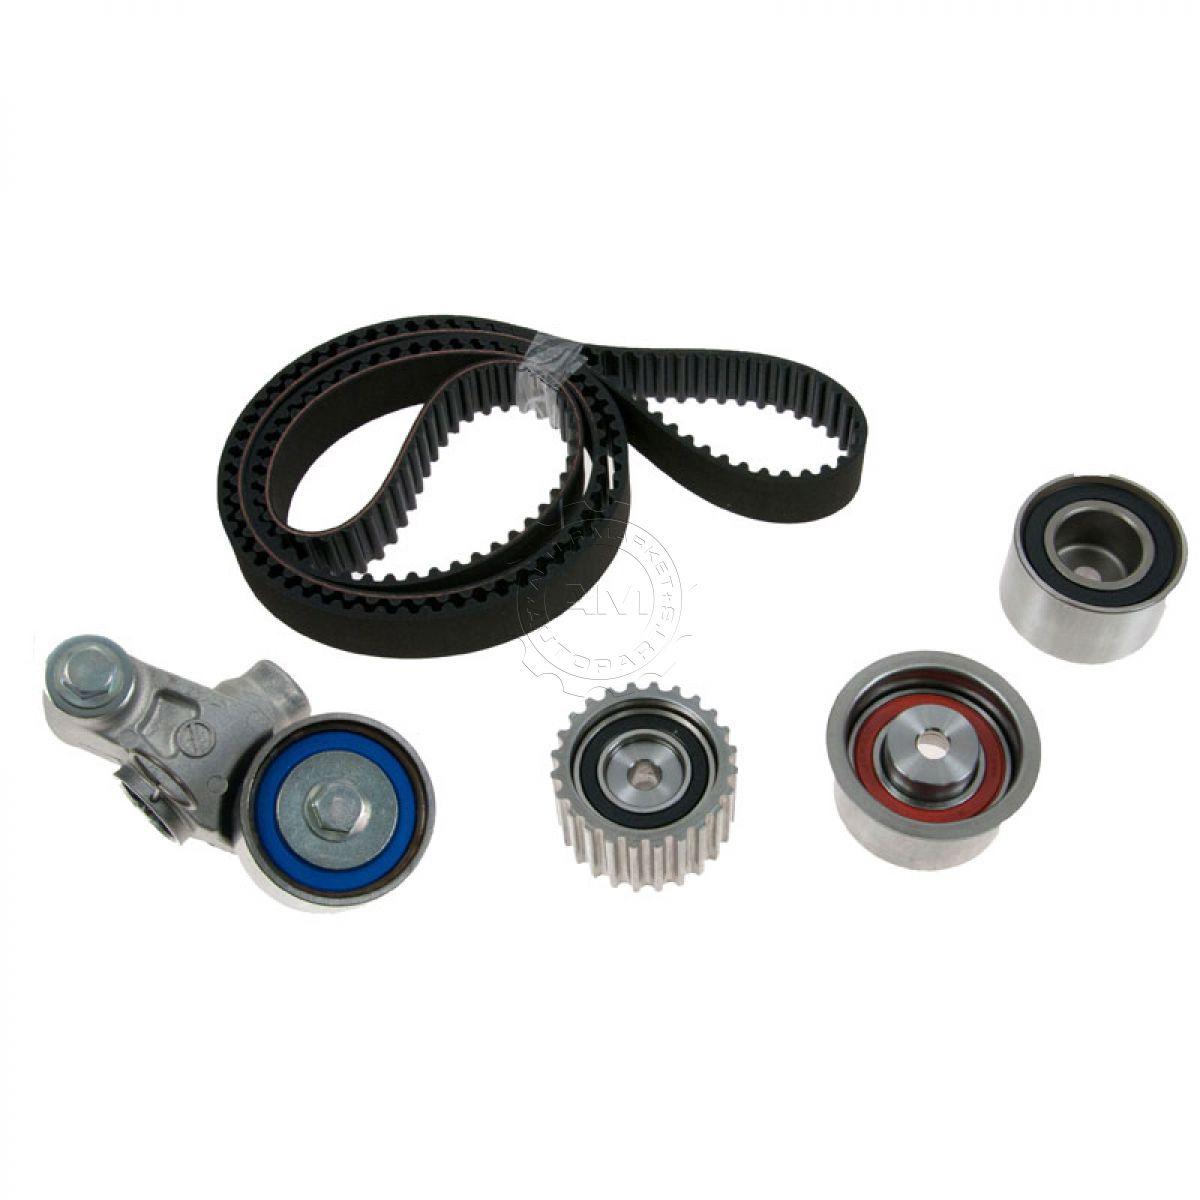 Gates Tck304 Timing Belt Component Kit For Subaru Forester Legacy 00 Saab 9 5 Impreza